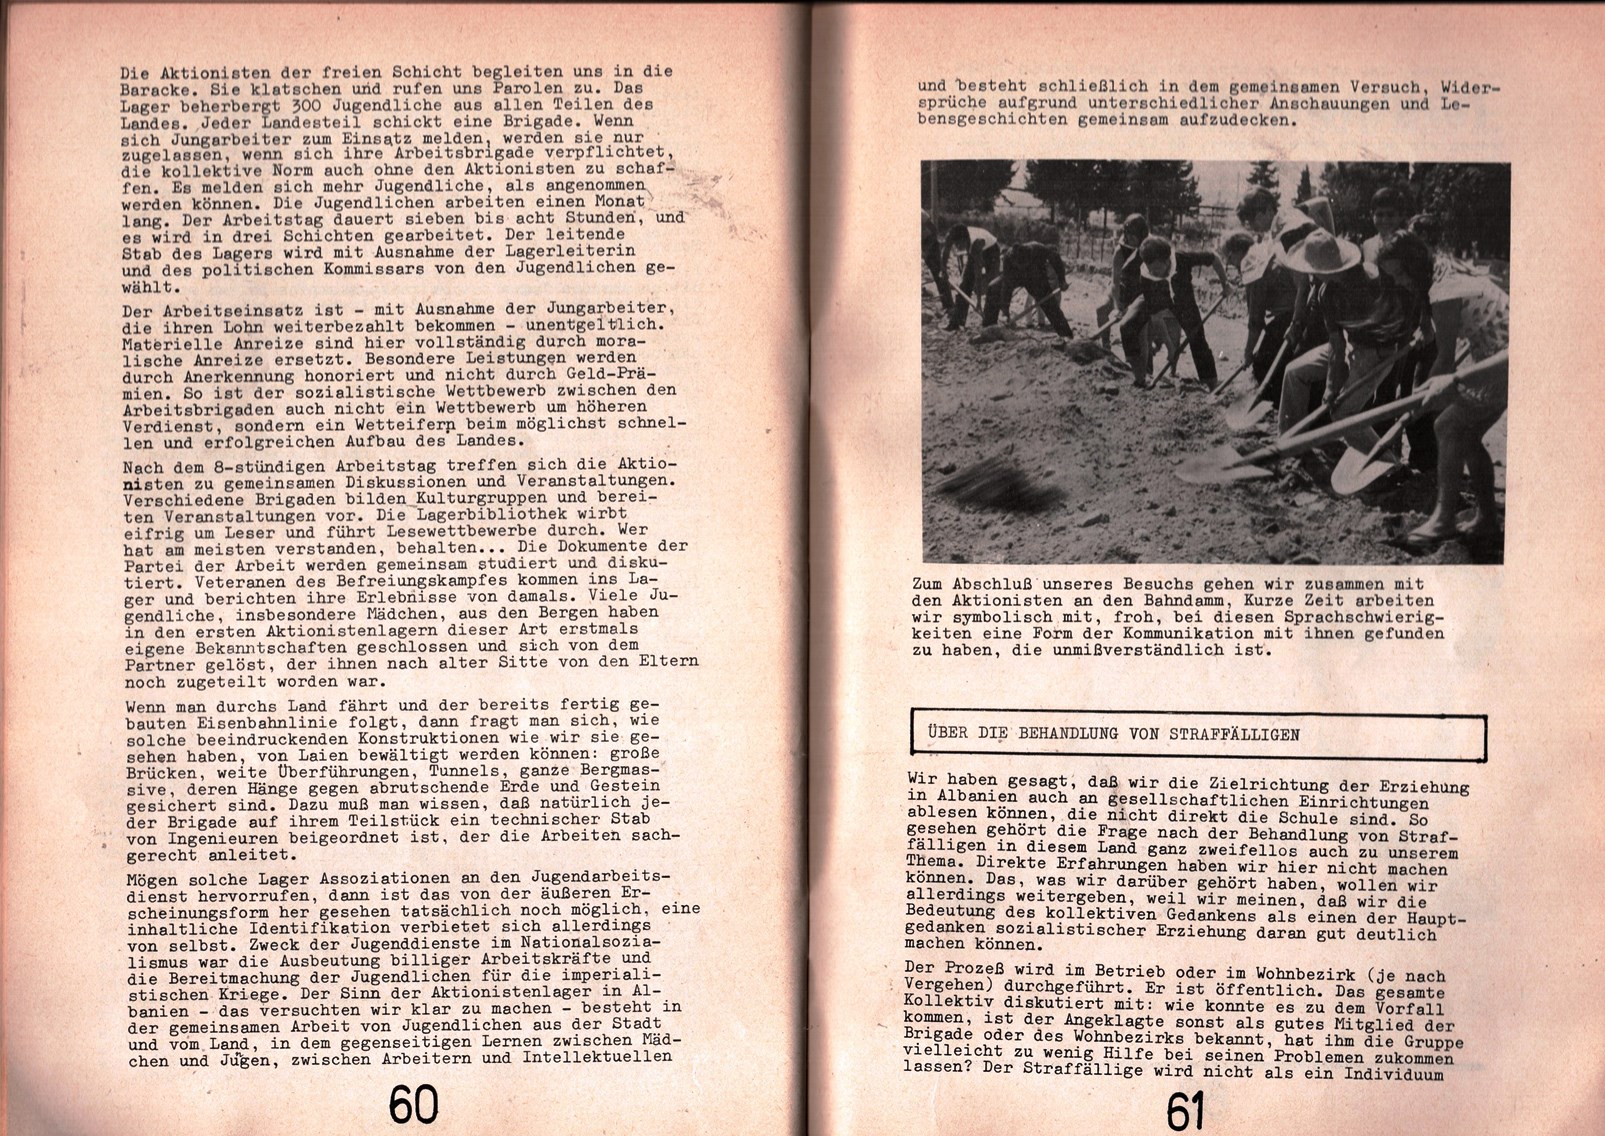 Berlin_1974_Reisebericht_Albanien_033